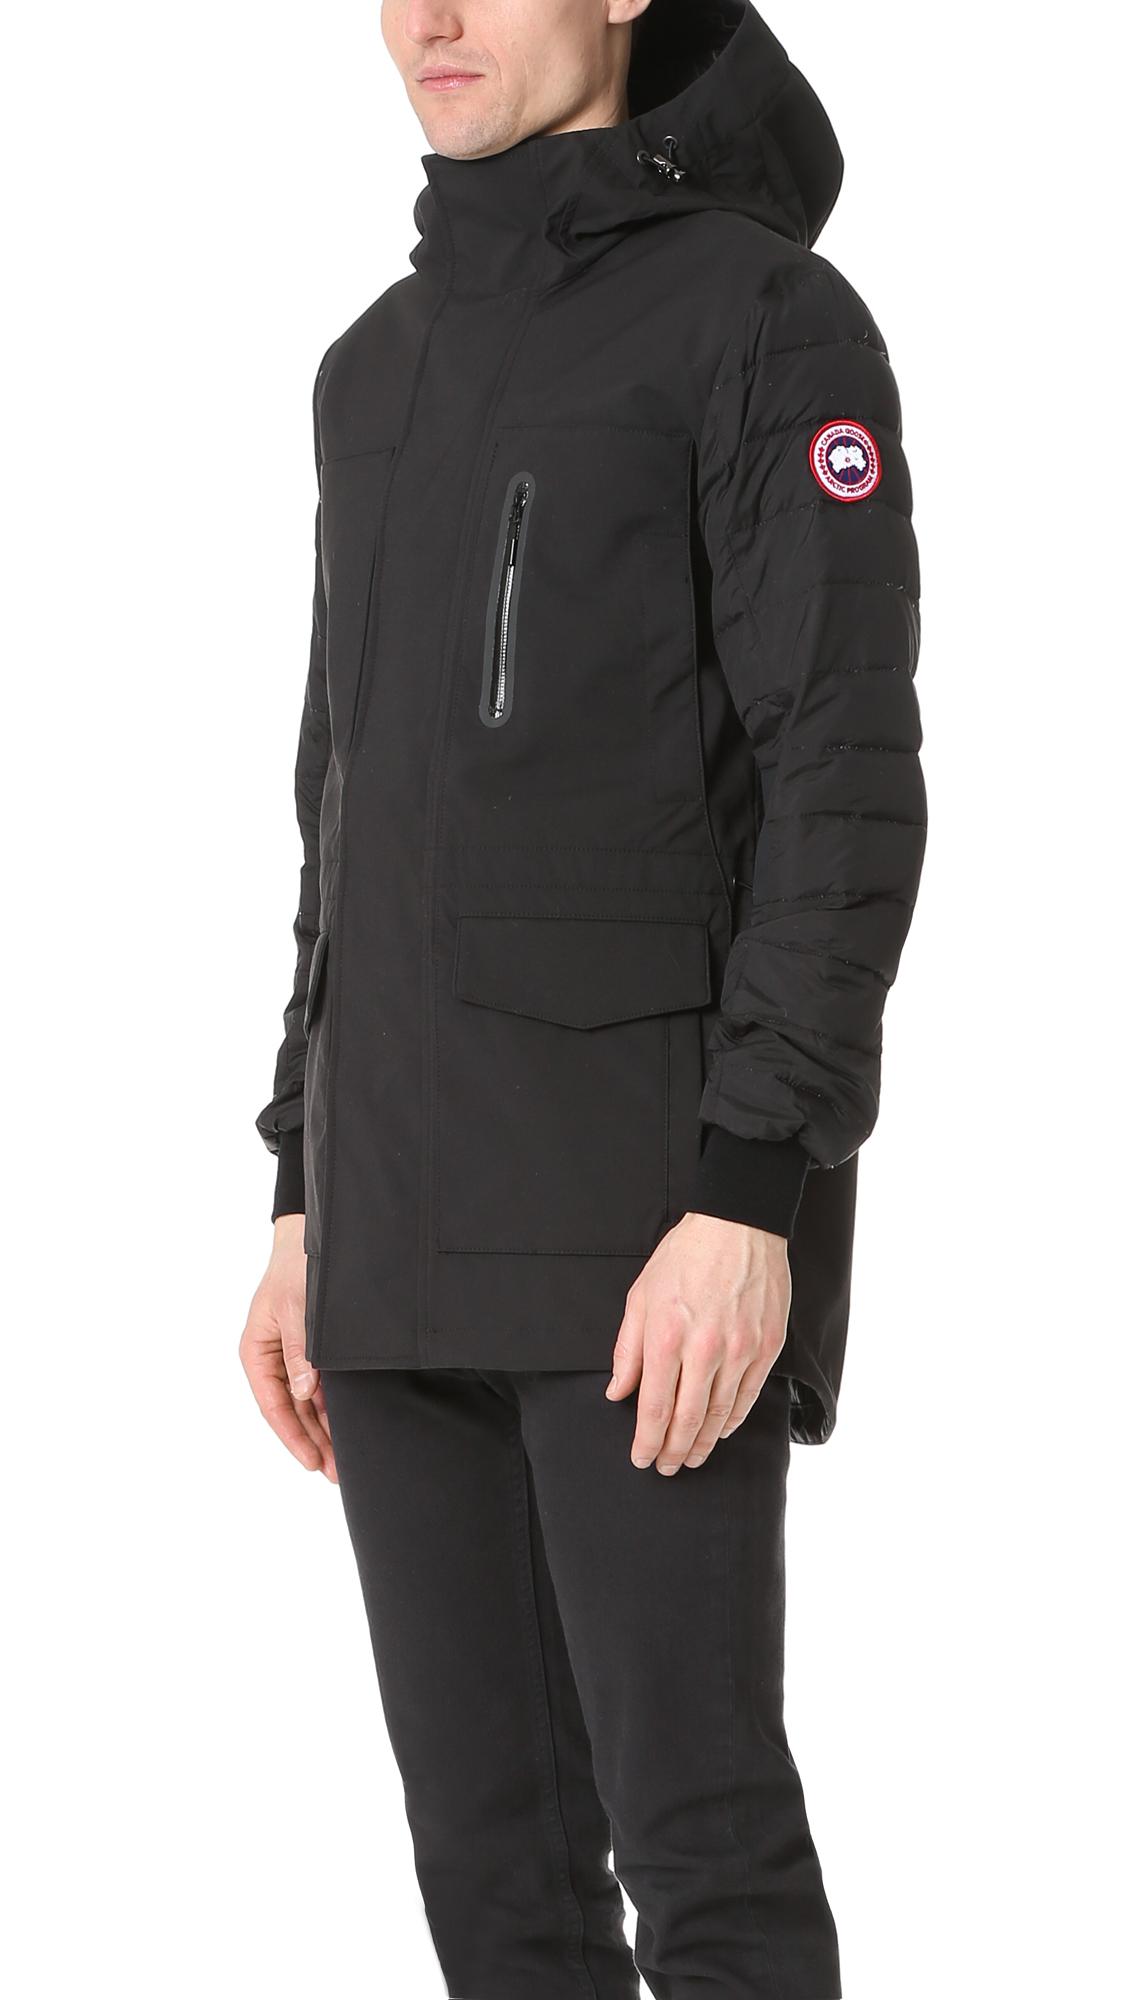 canada goose jacket temperature rating